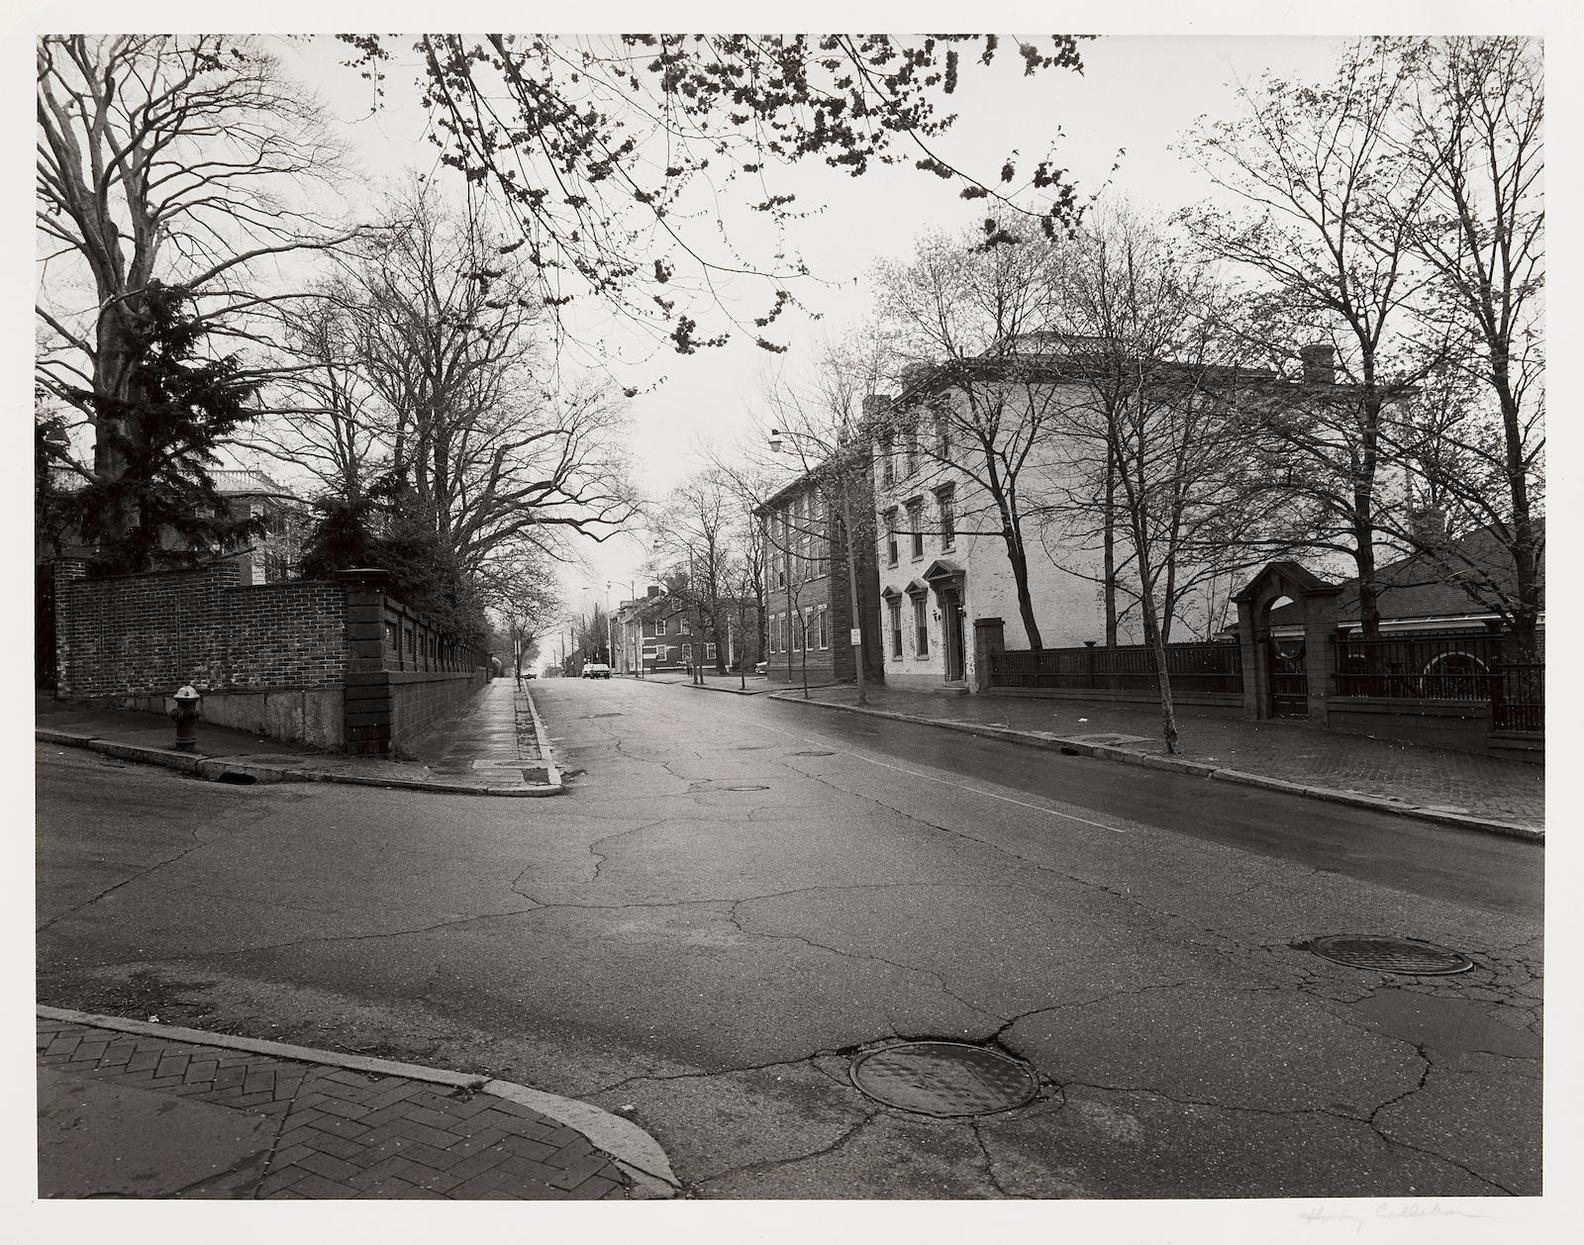 Harry Callahan-Benefit Street, Providence, Rhode Island-1970